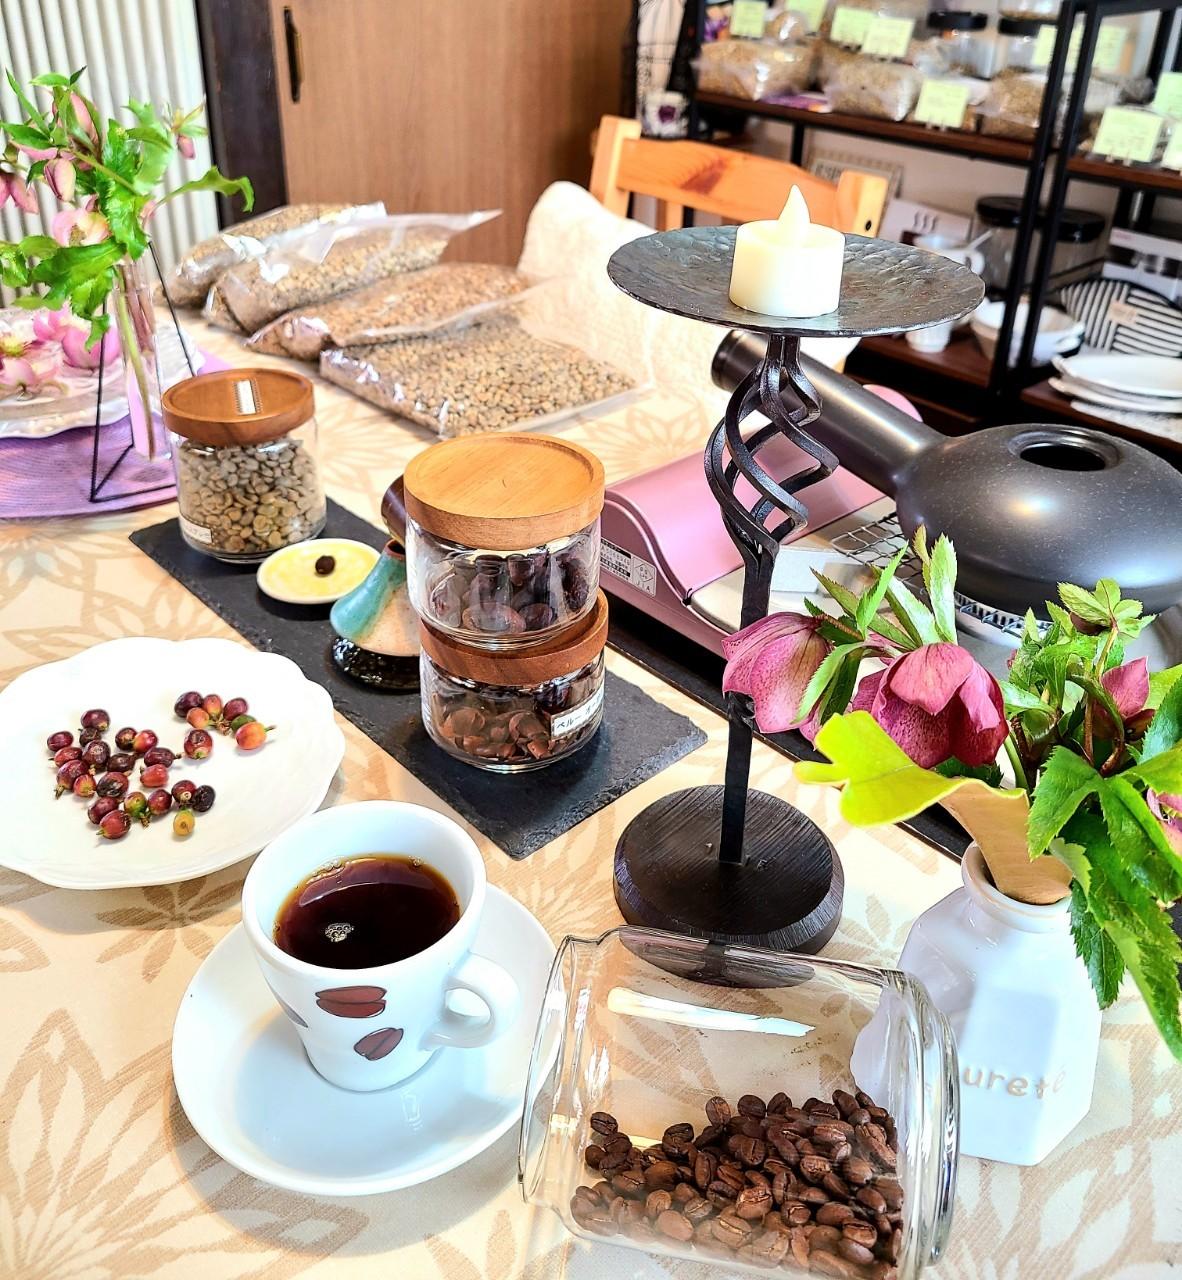 R3/8月 5周年 caffe fresco Nagi |広島 珈琲教室 コーヒー焙煎・珈琲(コーヒー)講座